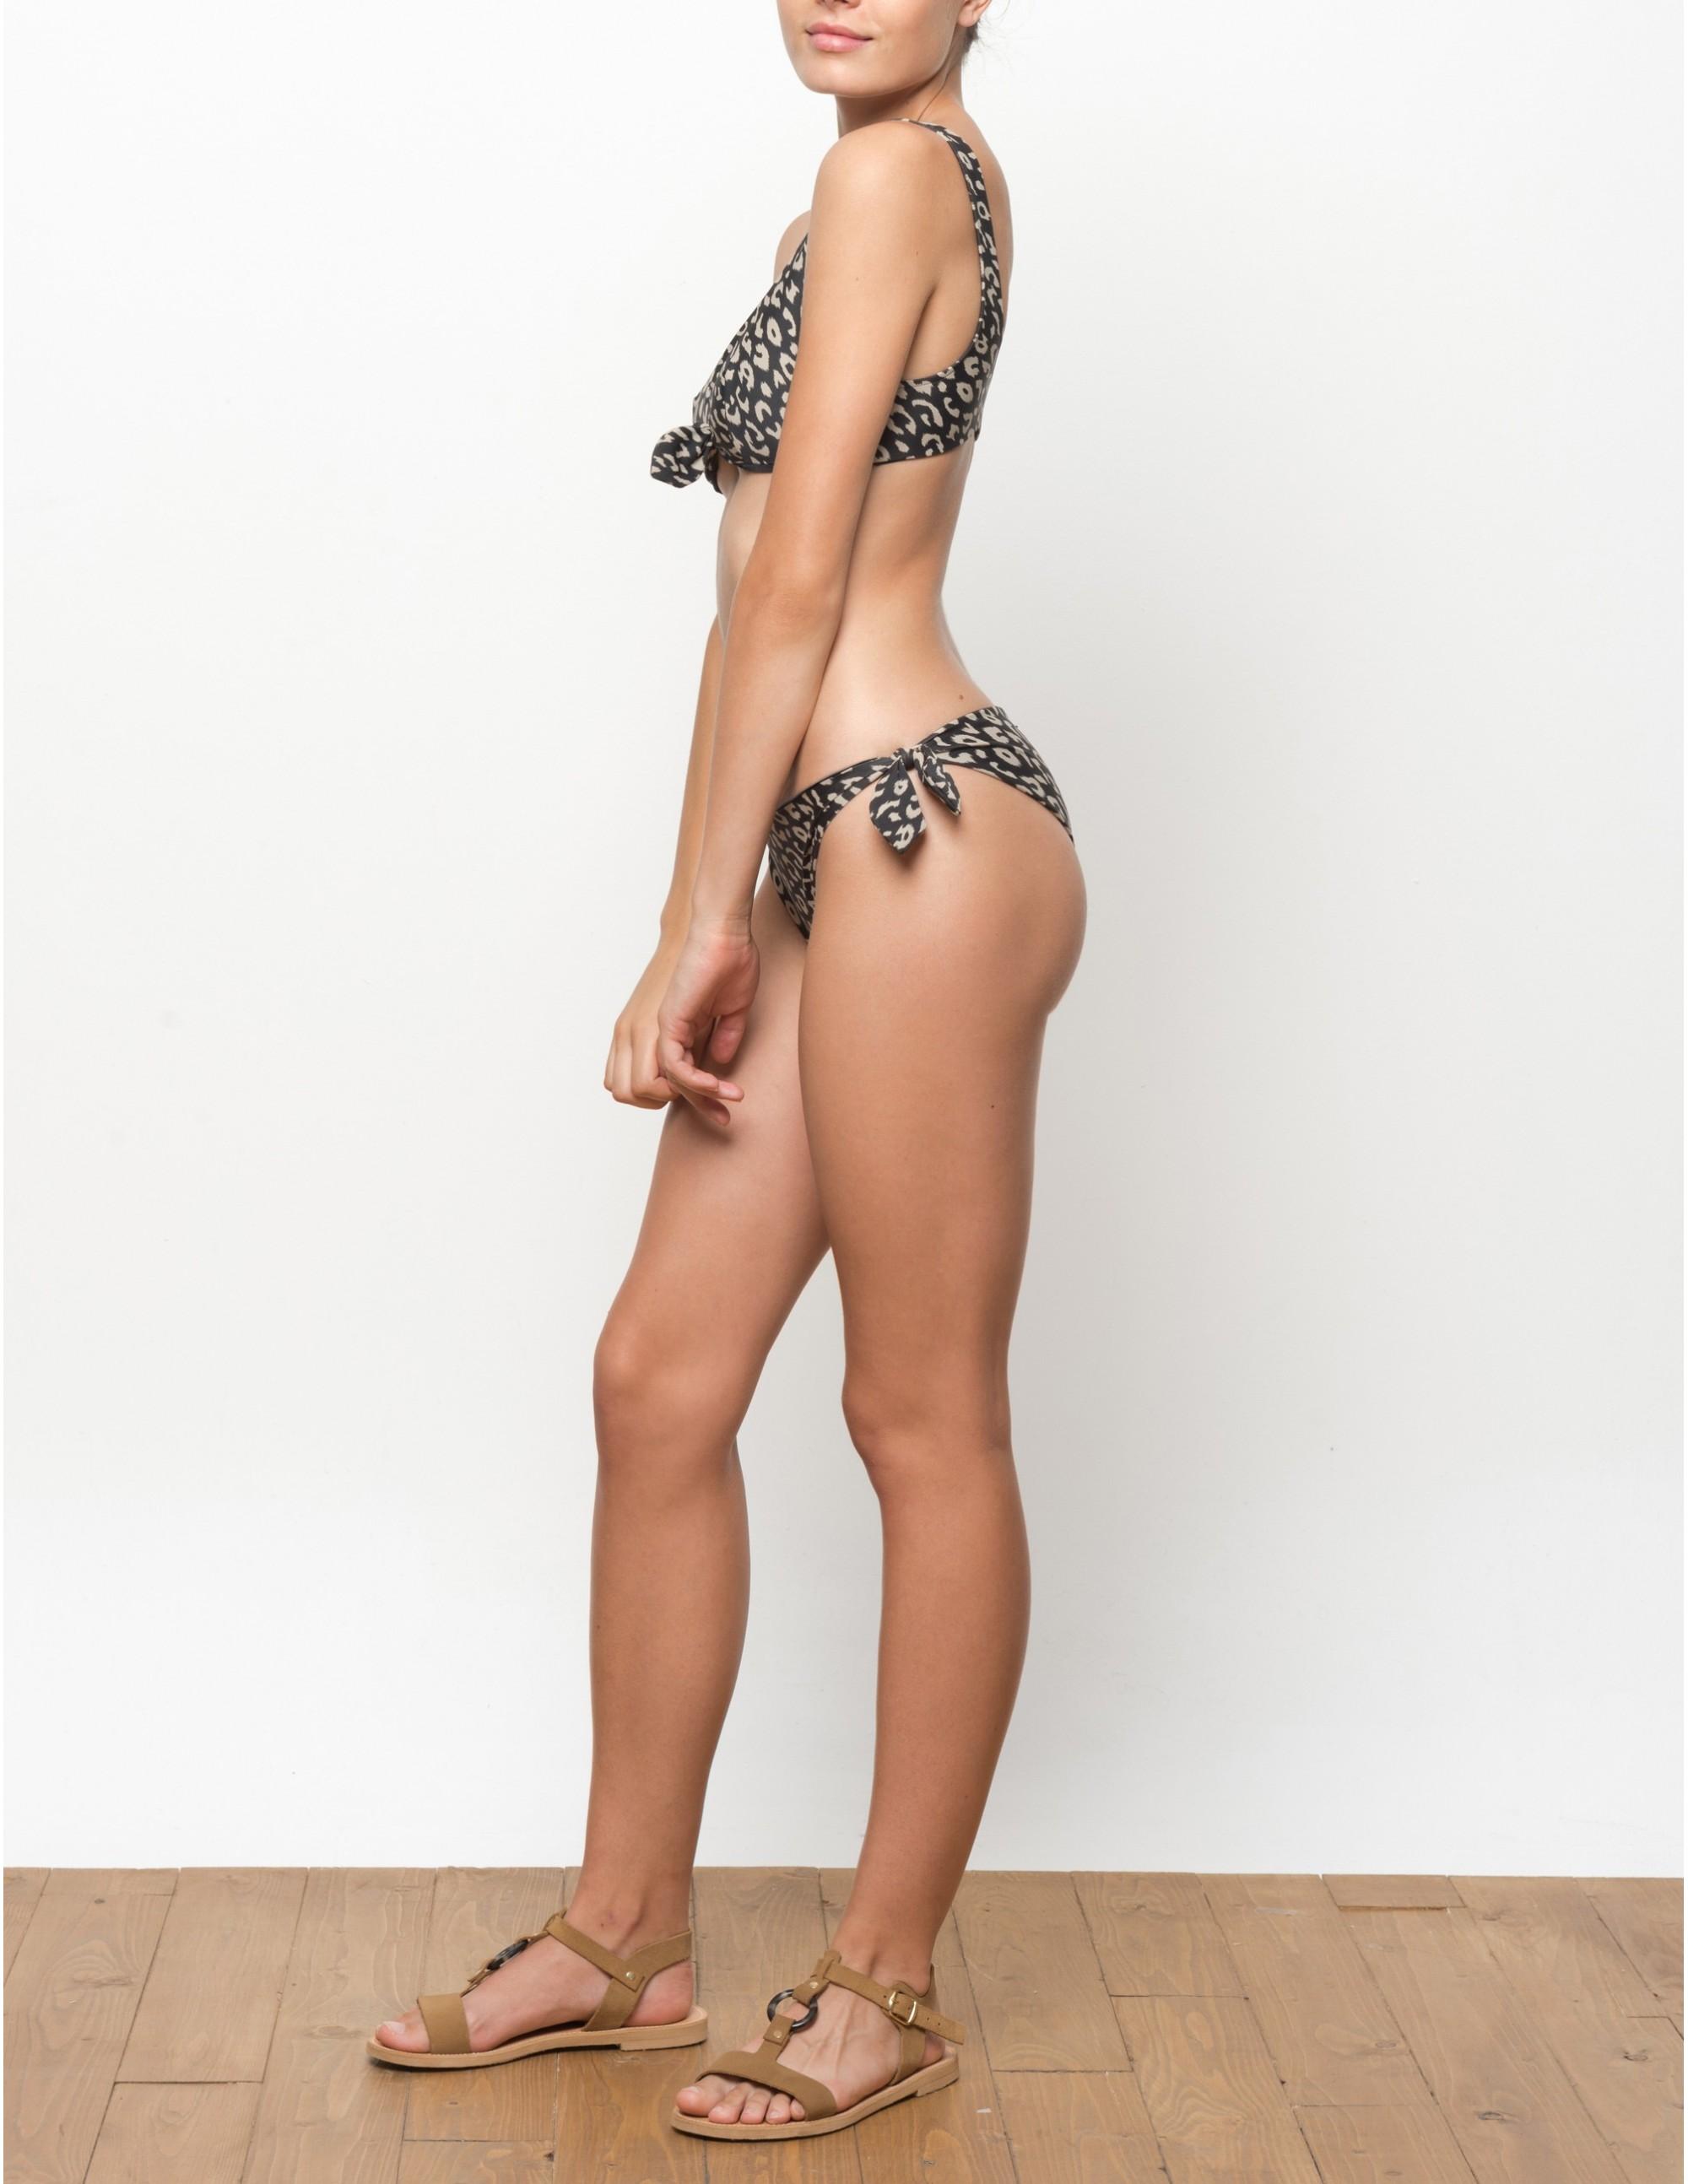 MISALI bikini bottom - LEOPARD